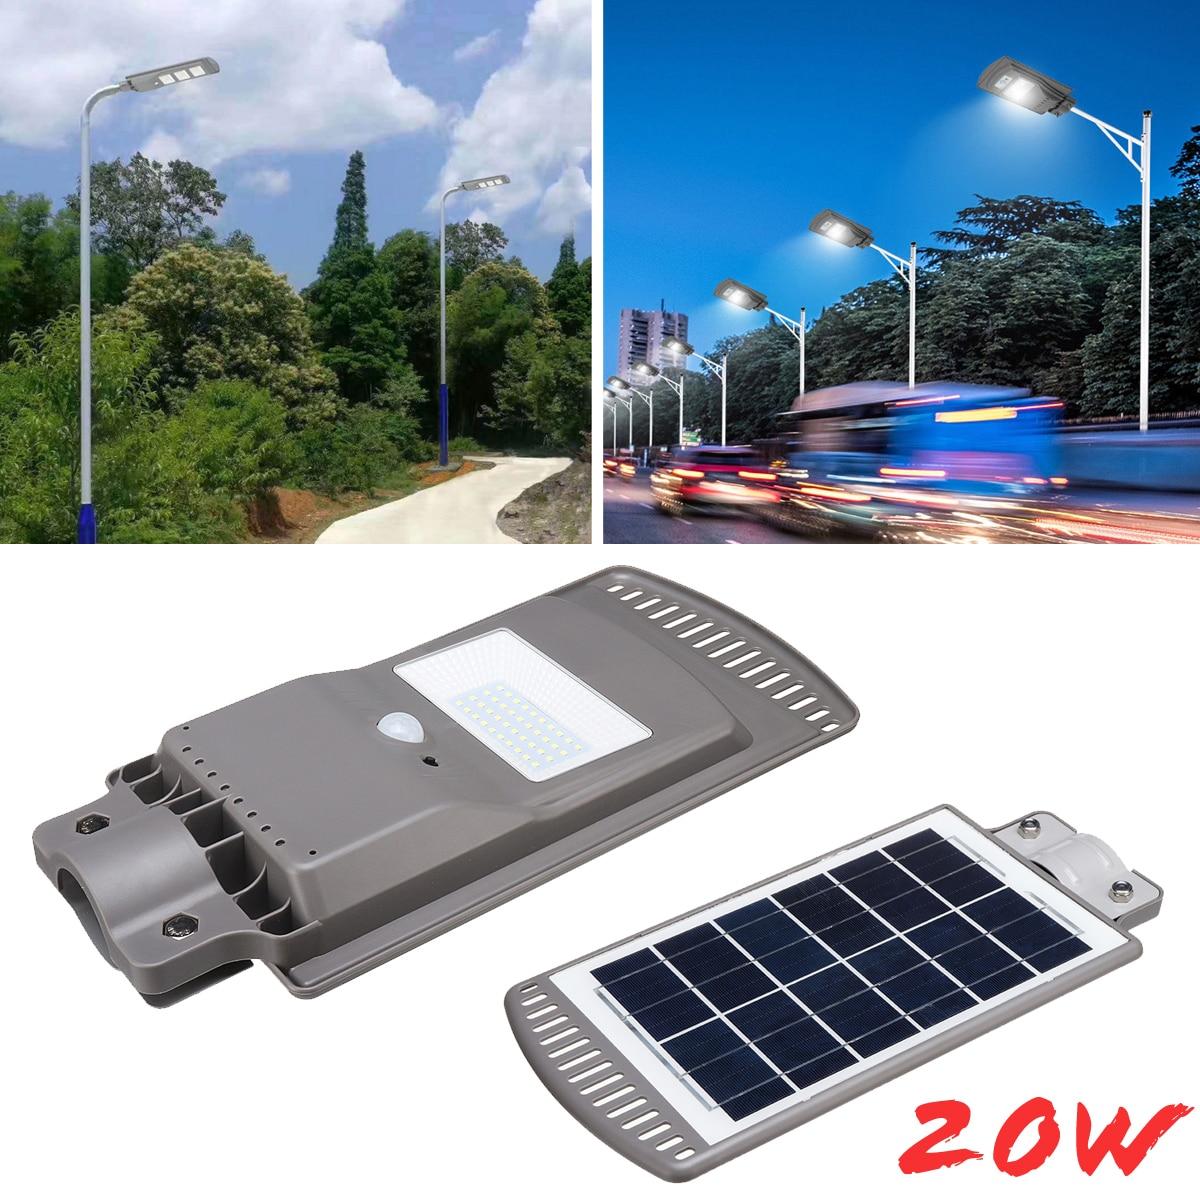 ip67 a prova dip67 agua 20 w painel solar led luz de rua solar tudo em